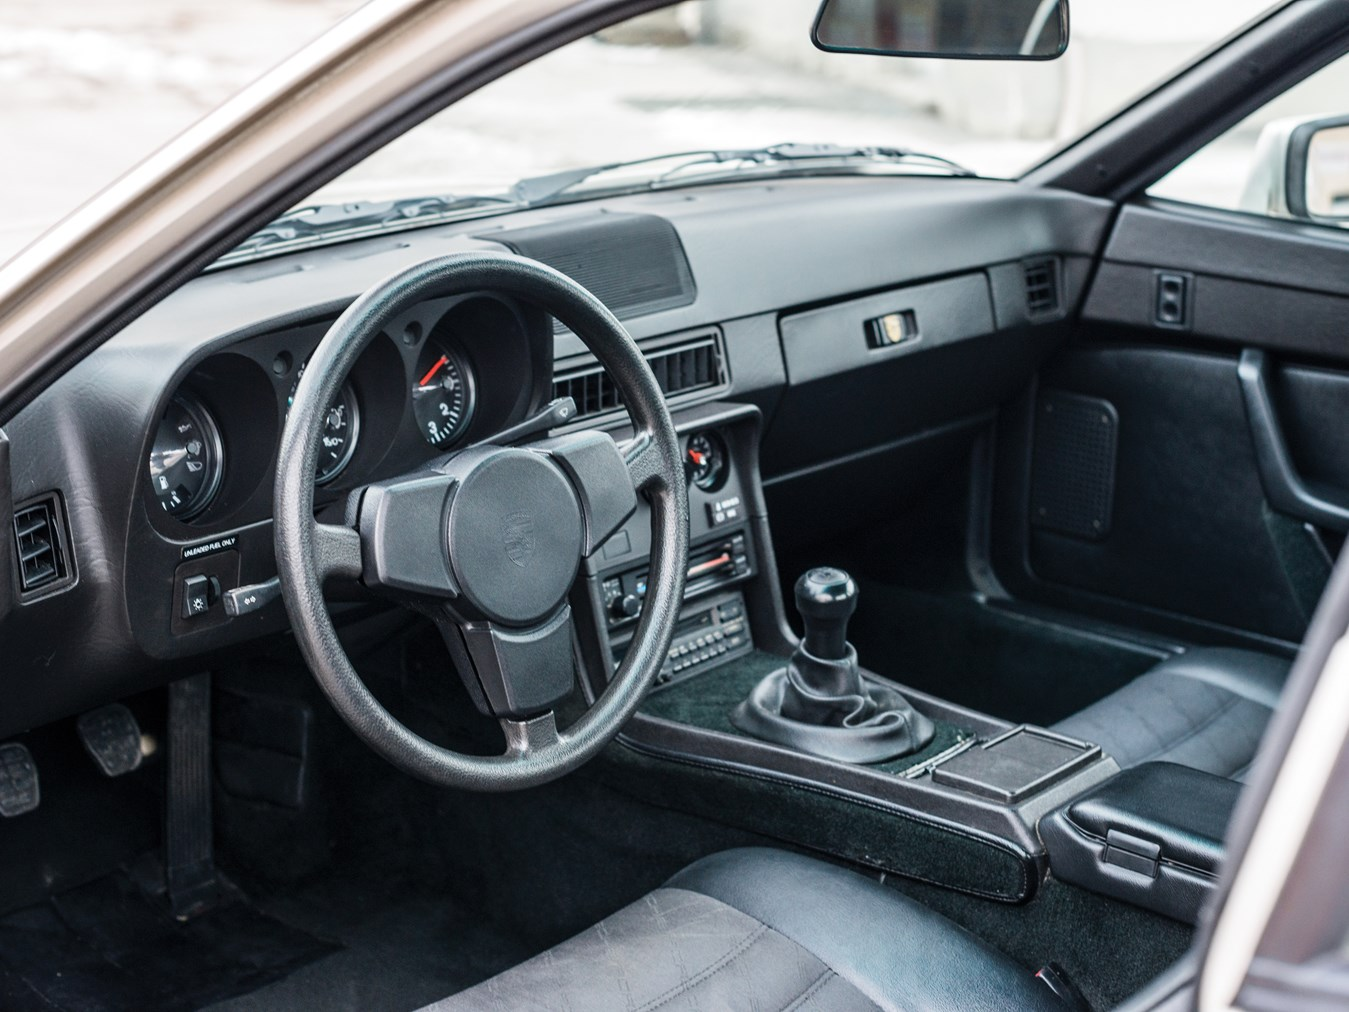 1987 Porsche 924 S interior